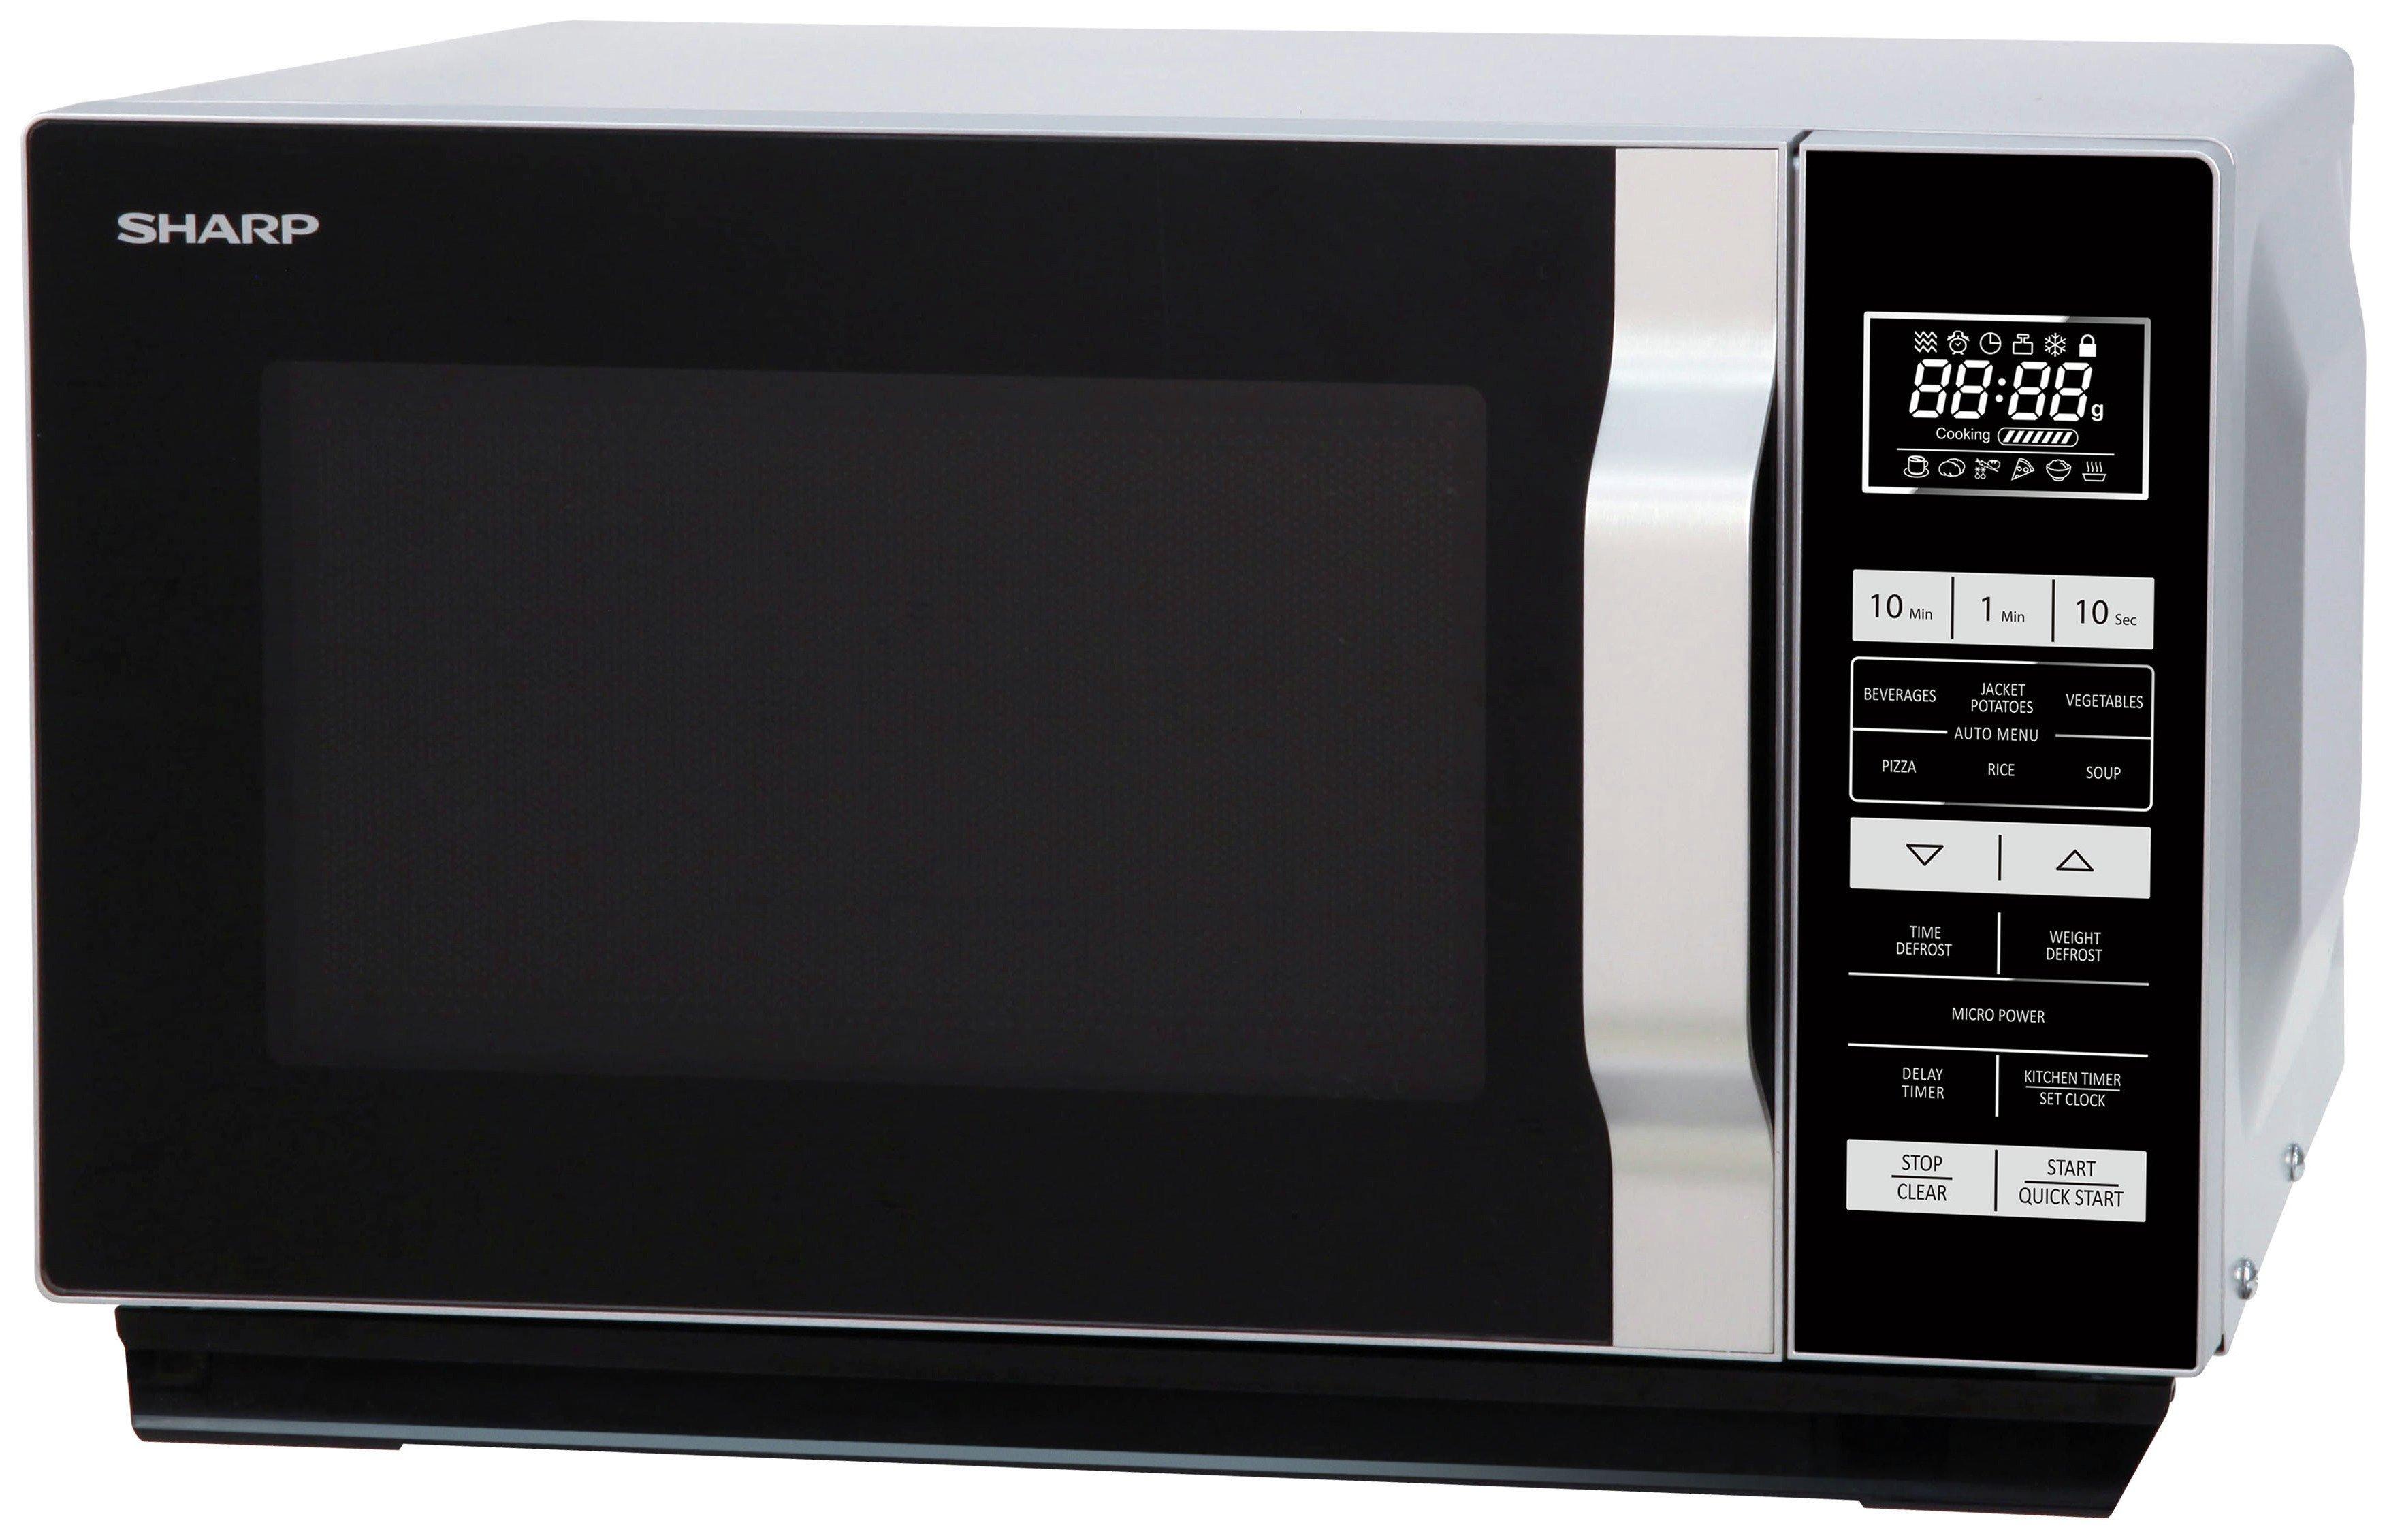 sharp 900w combination flatbed microwave r861. sharp 800w standard flatbed microwave r360slm - silver 900w combination r861